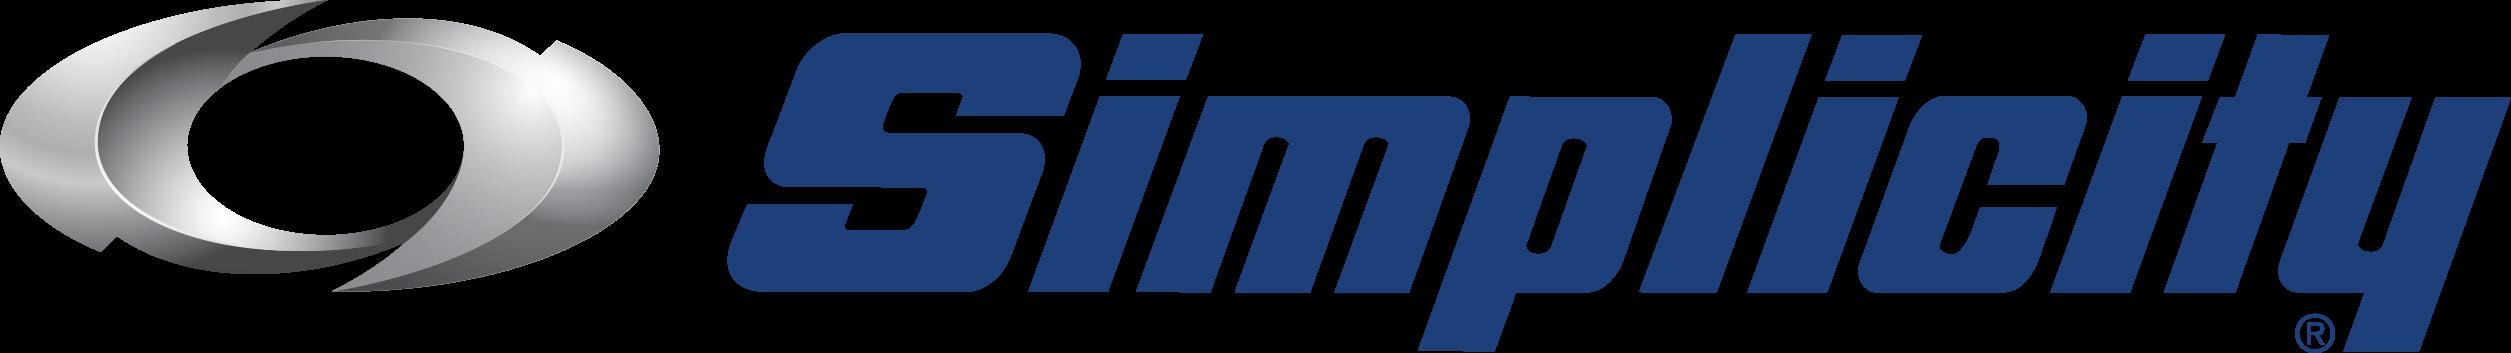 Kent Equipment Logo